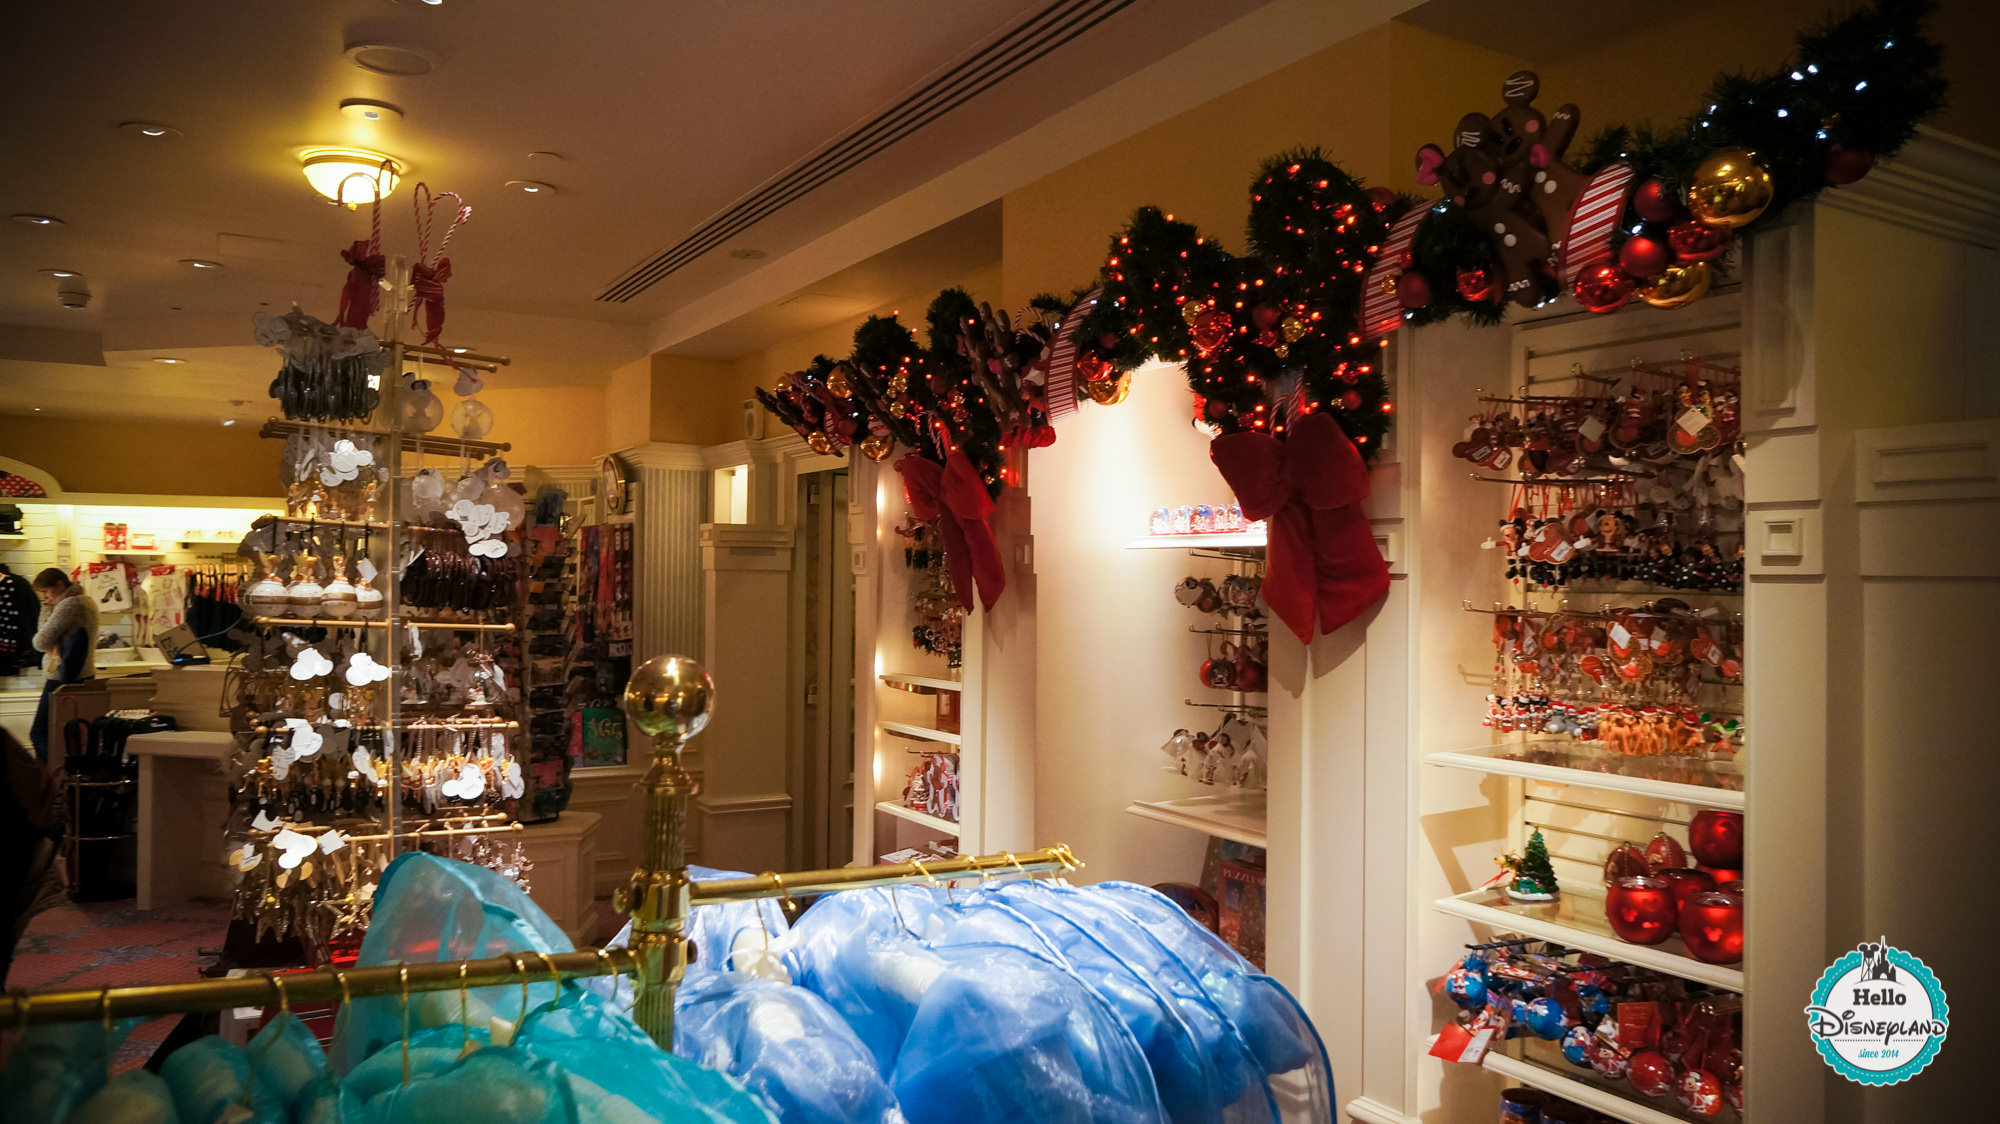 Hello Disneyland : Le blog n°1 sur Disneyland Paris